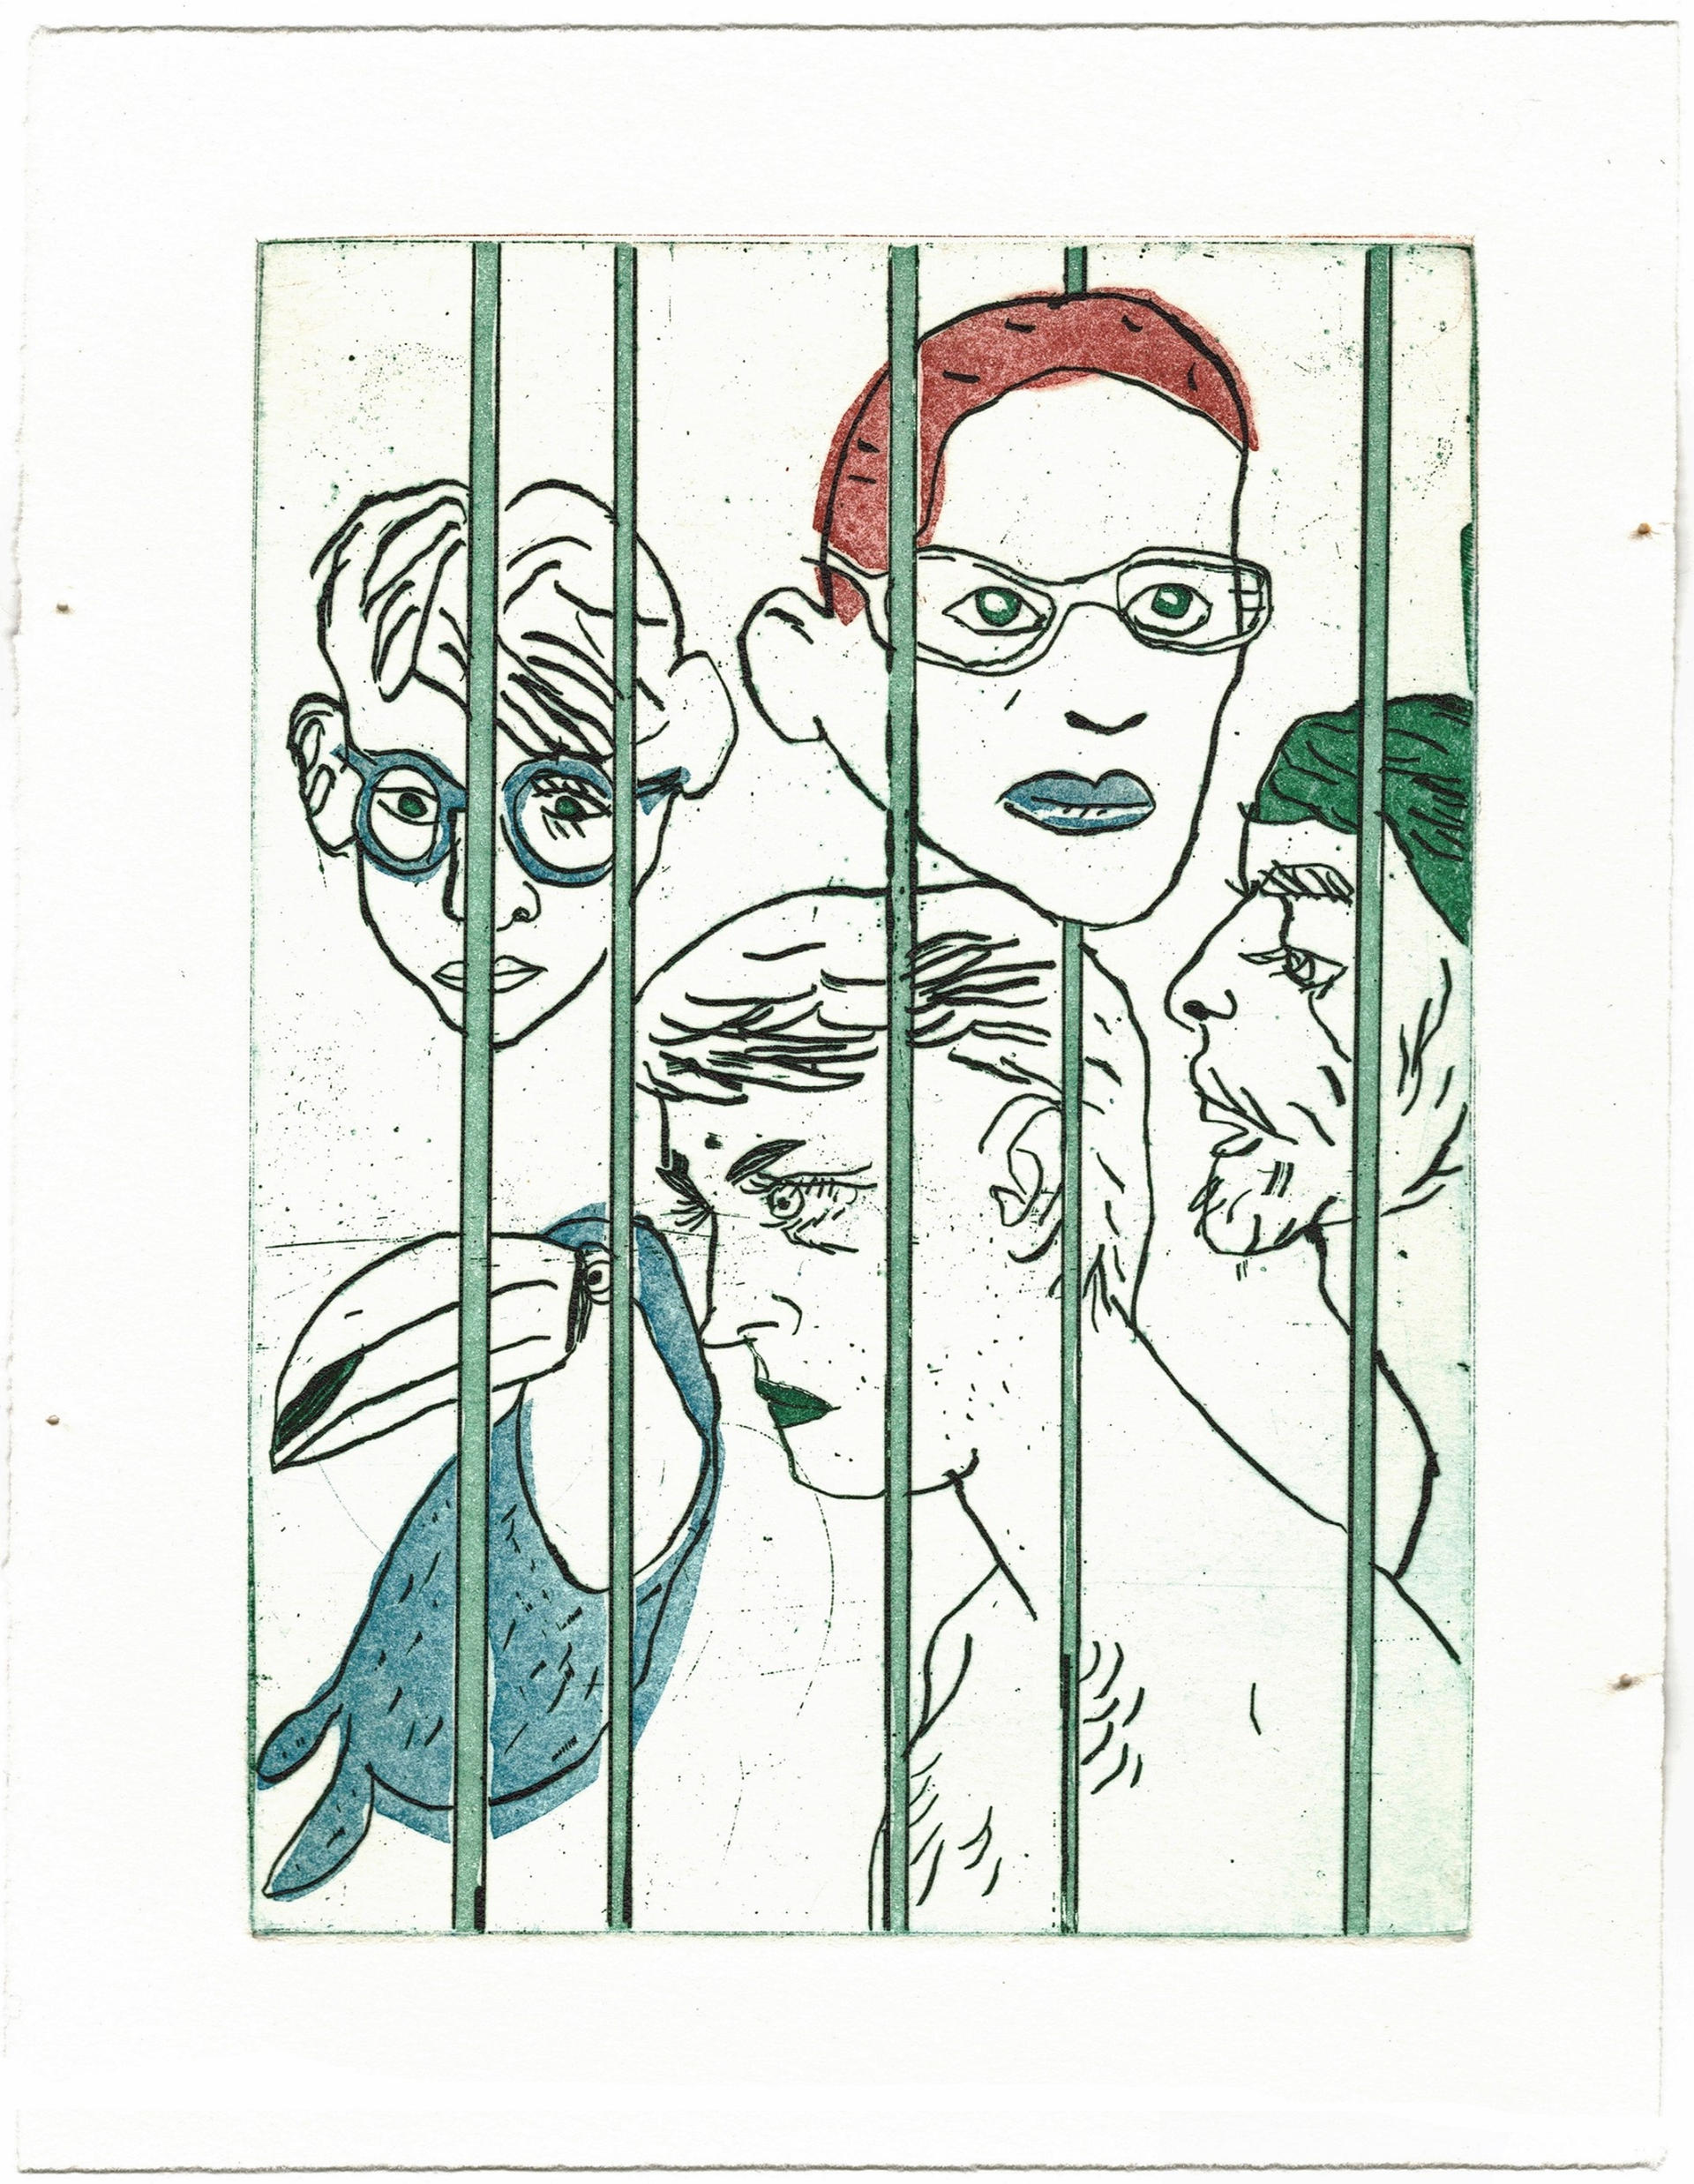 Jailbirds - Proof #2